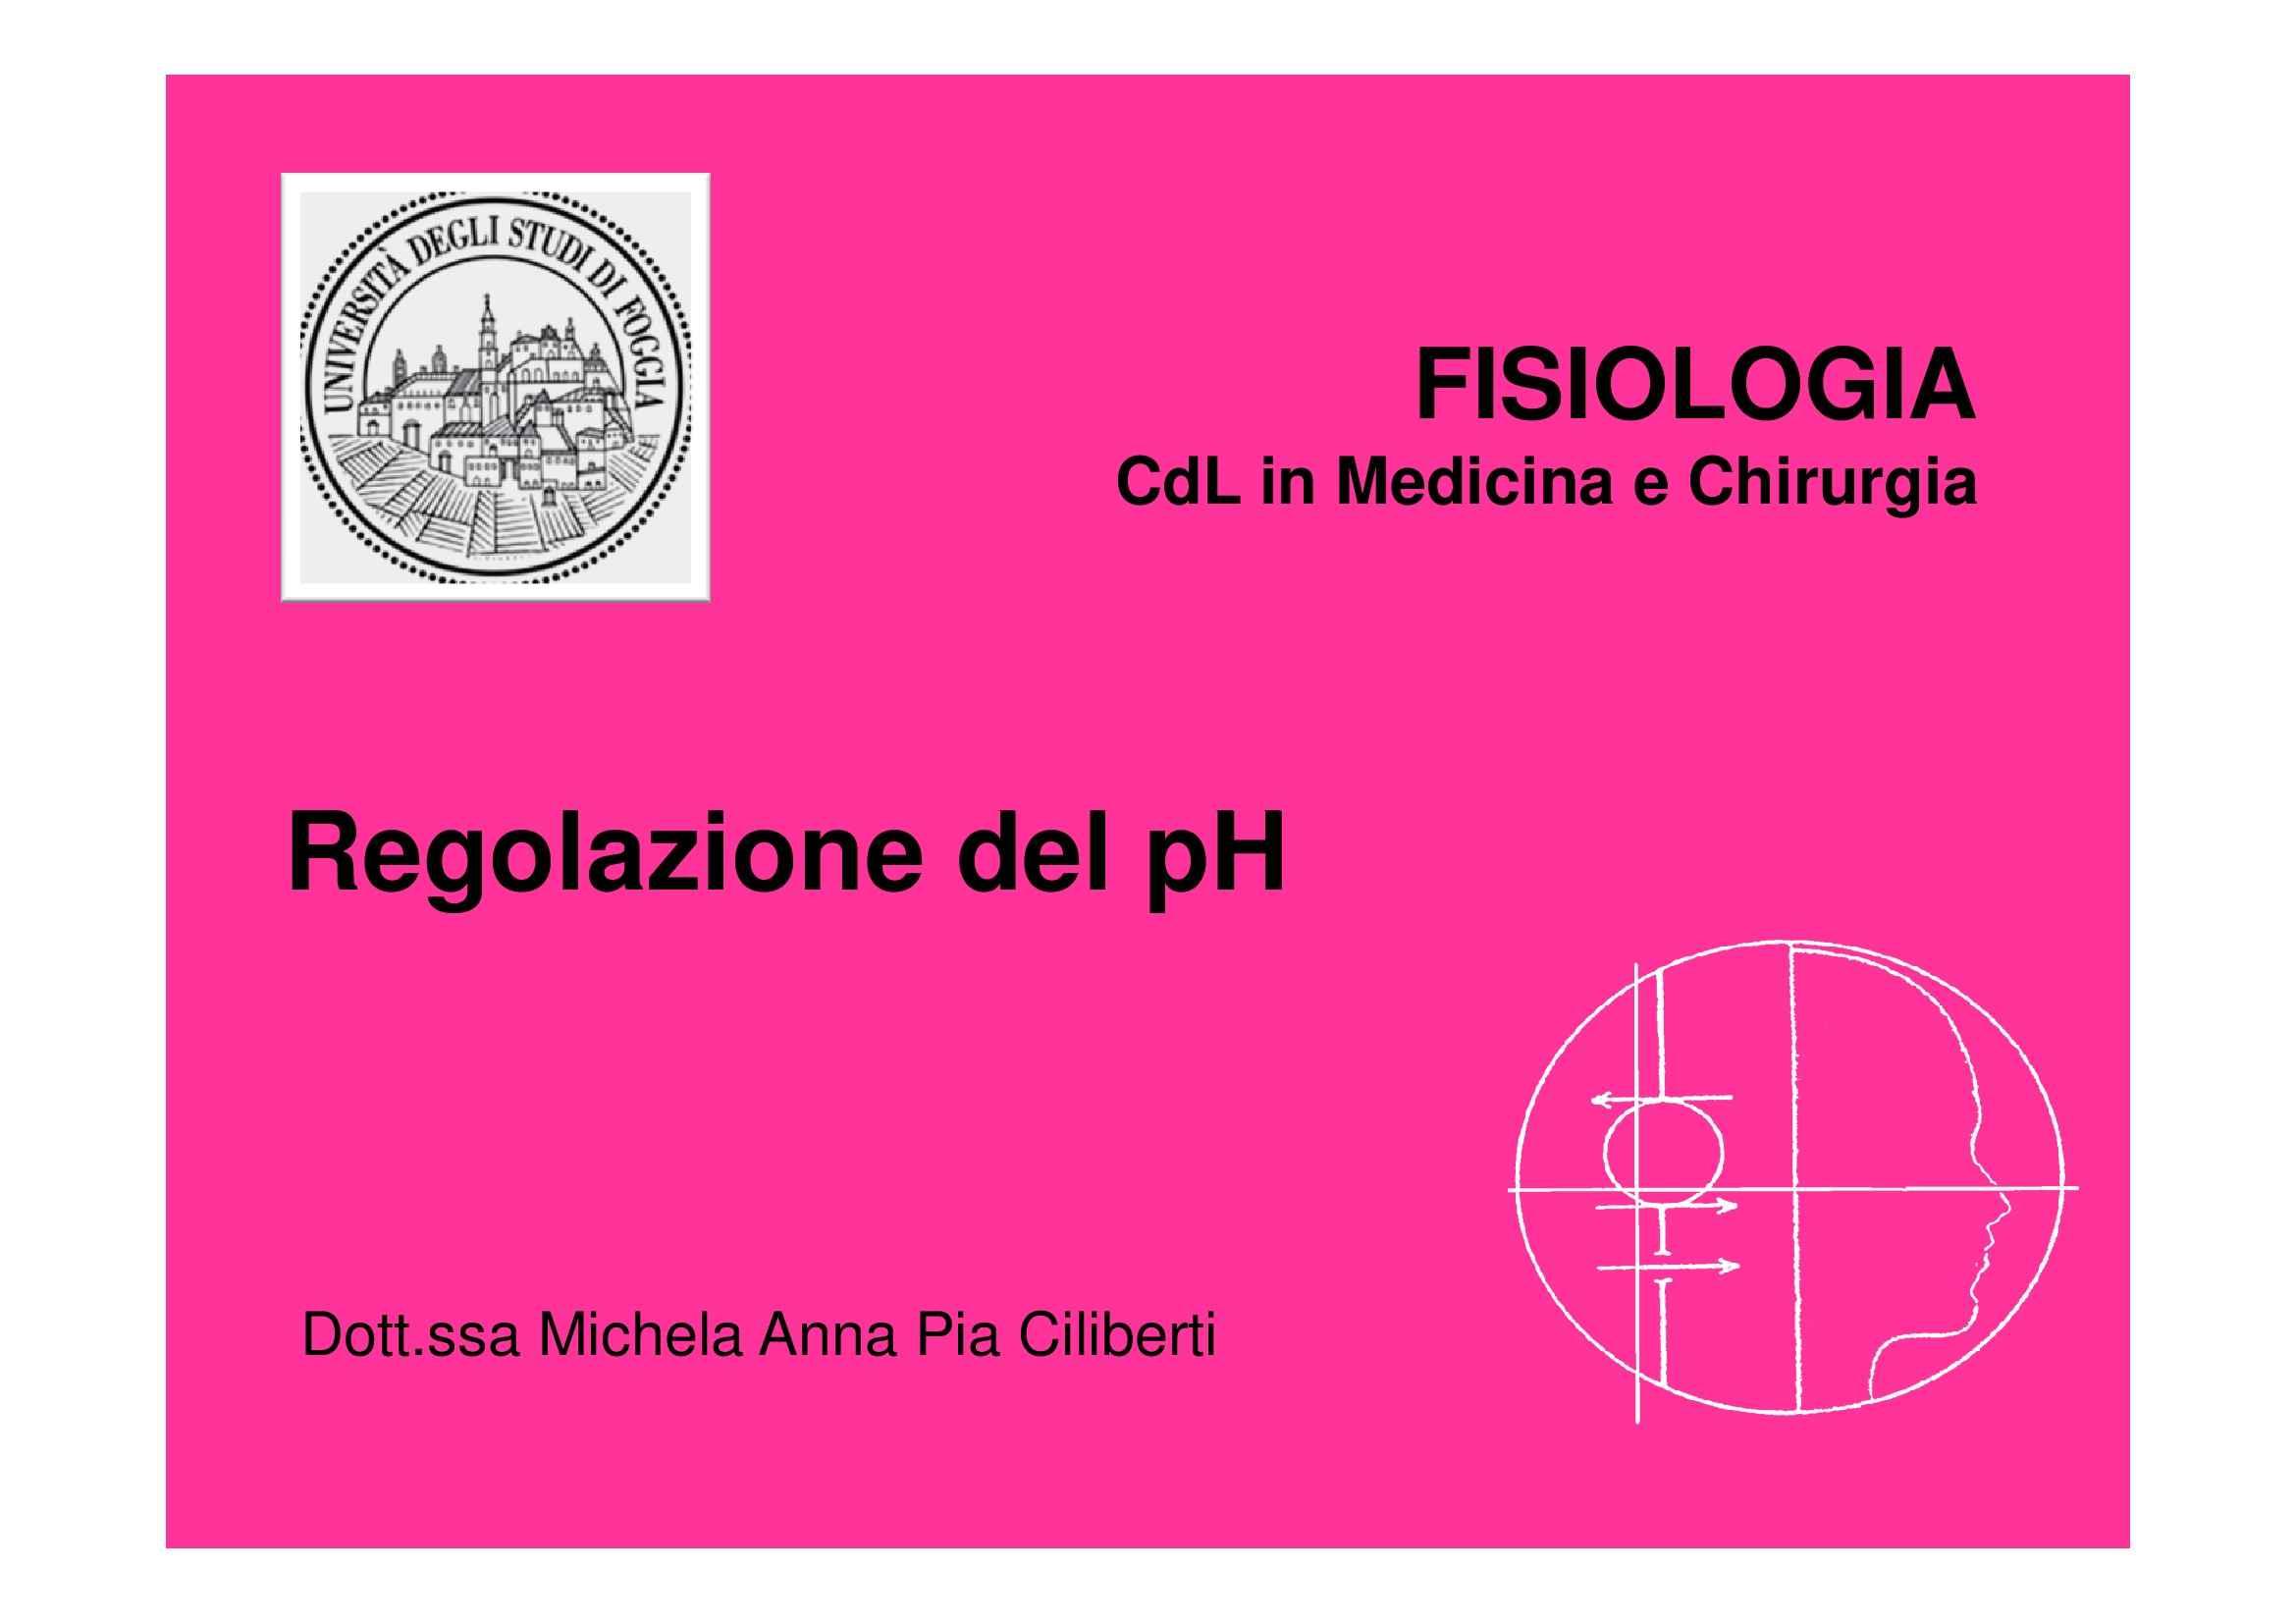 Fisiologia umana II - regolazione pH